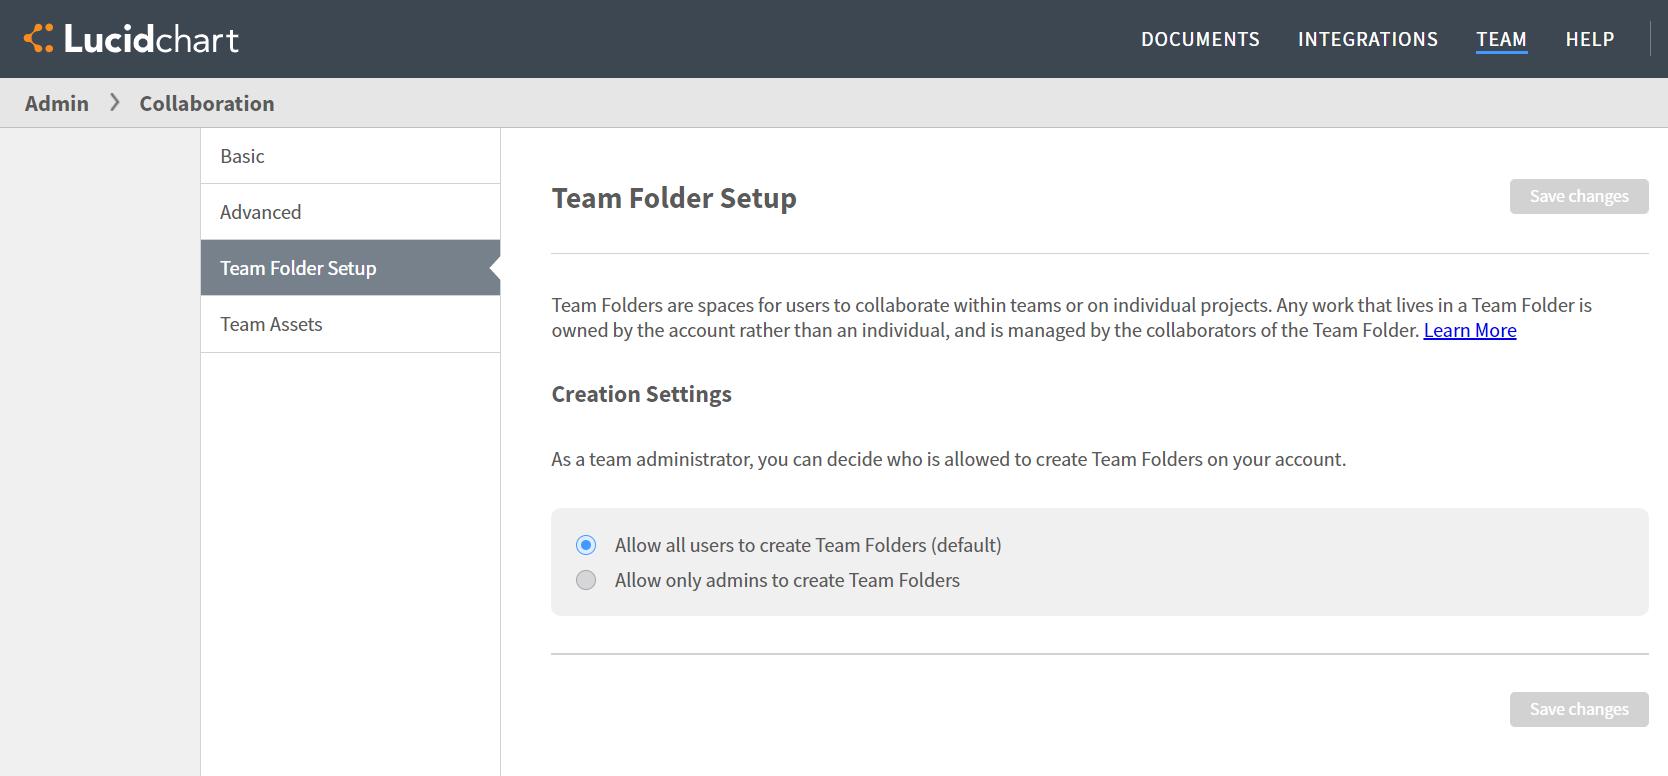 Admin team folder setup